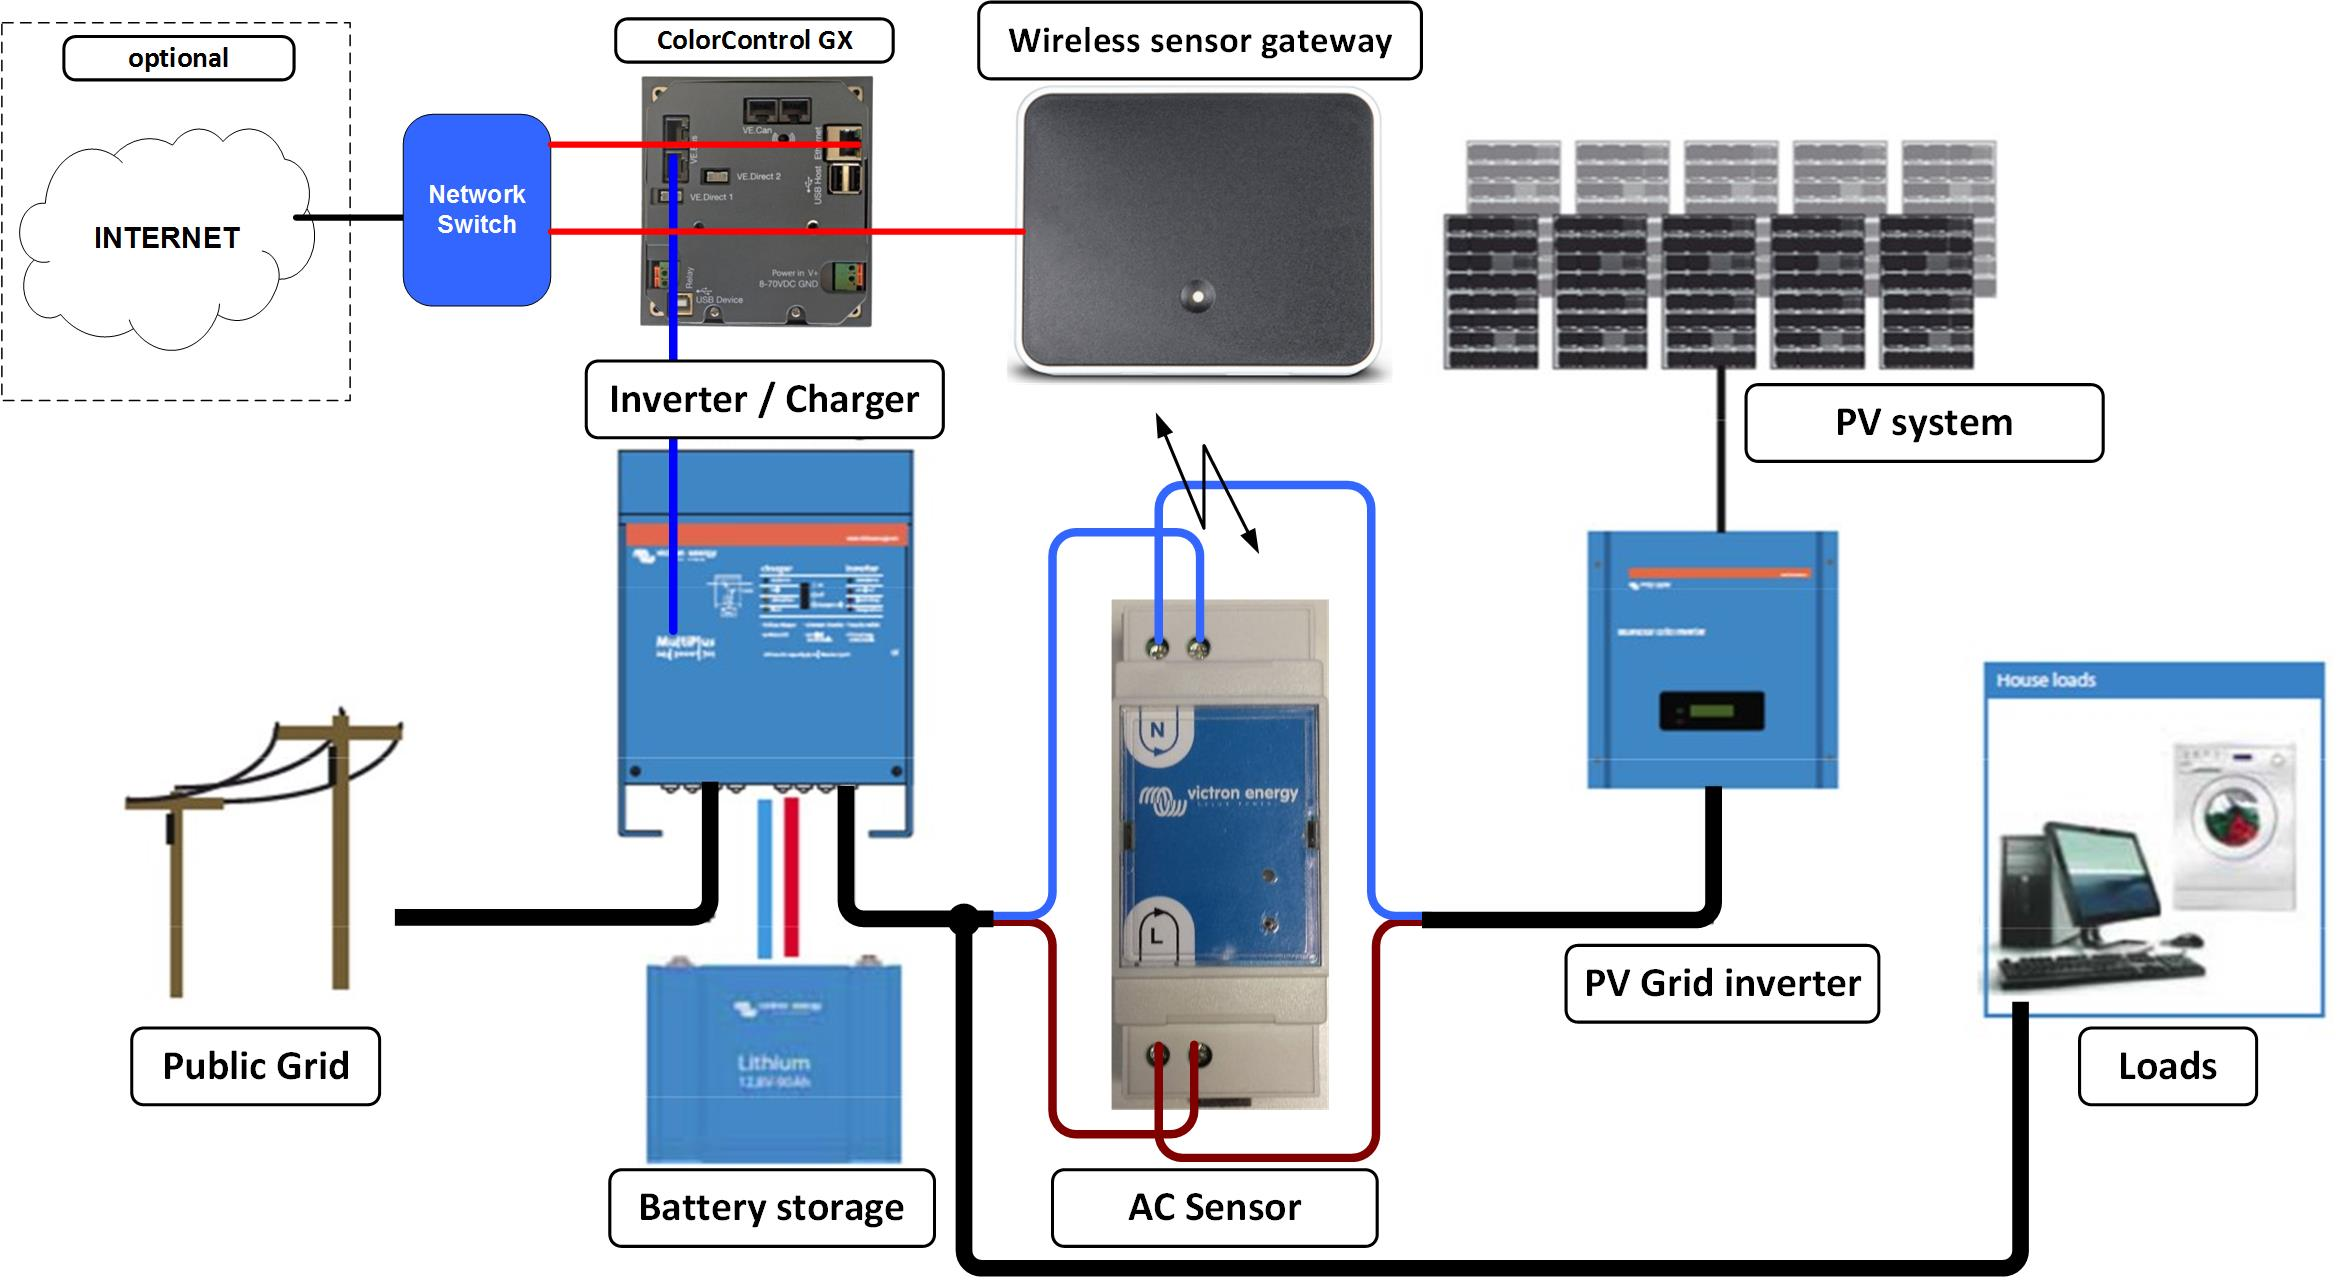 ccgx quby_gateway_schema?w=850&tok=8bbaf9 wireless ac sensor manual [victron energy] victron quattro wiring diagram at soozxer.org